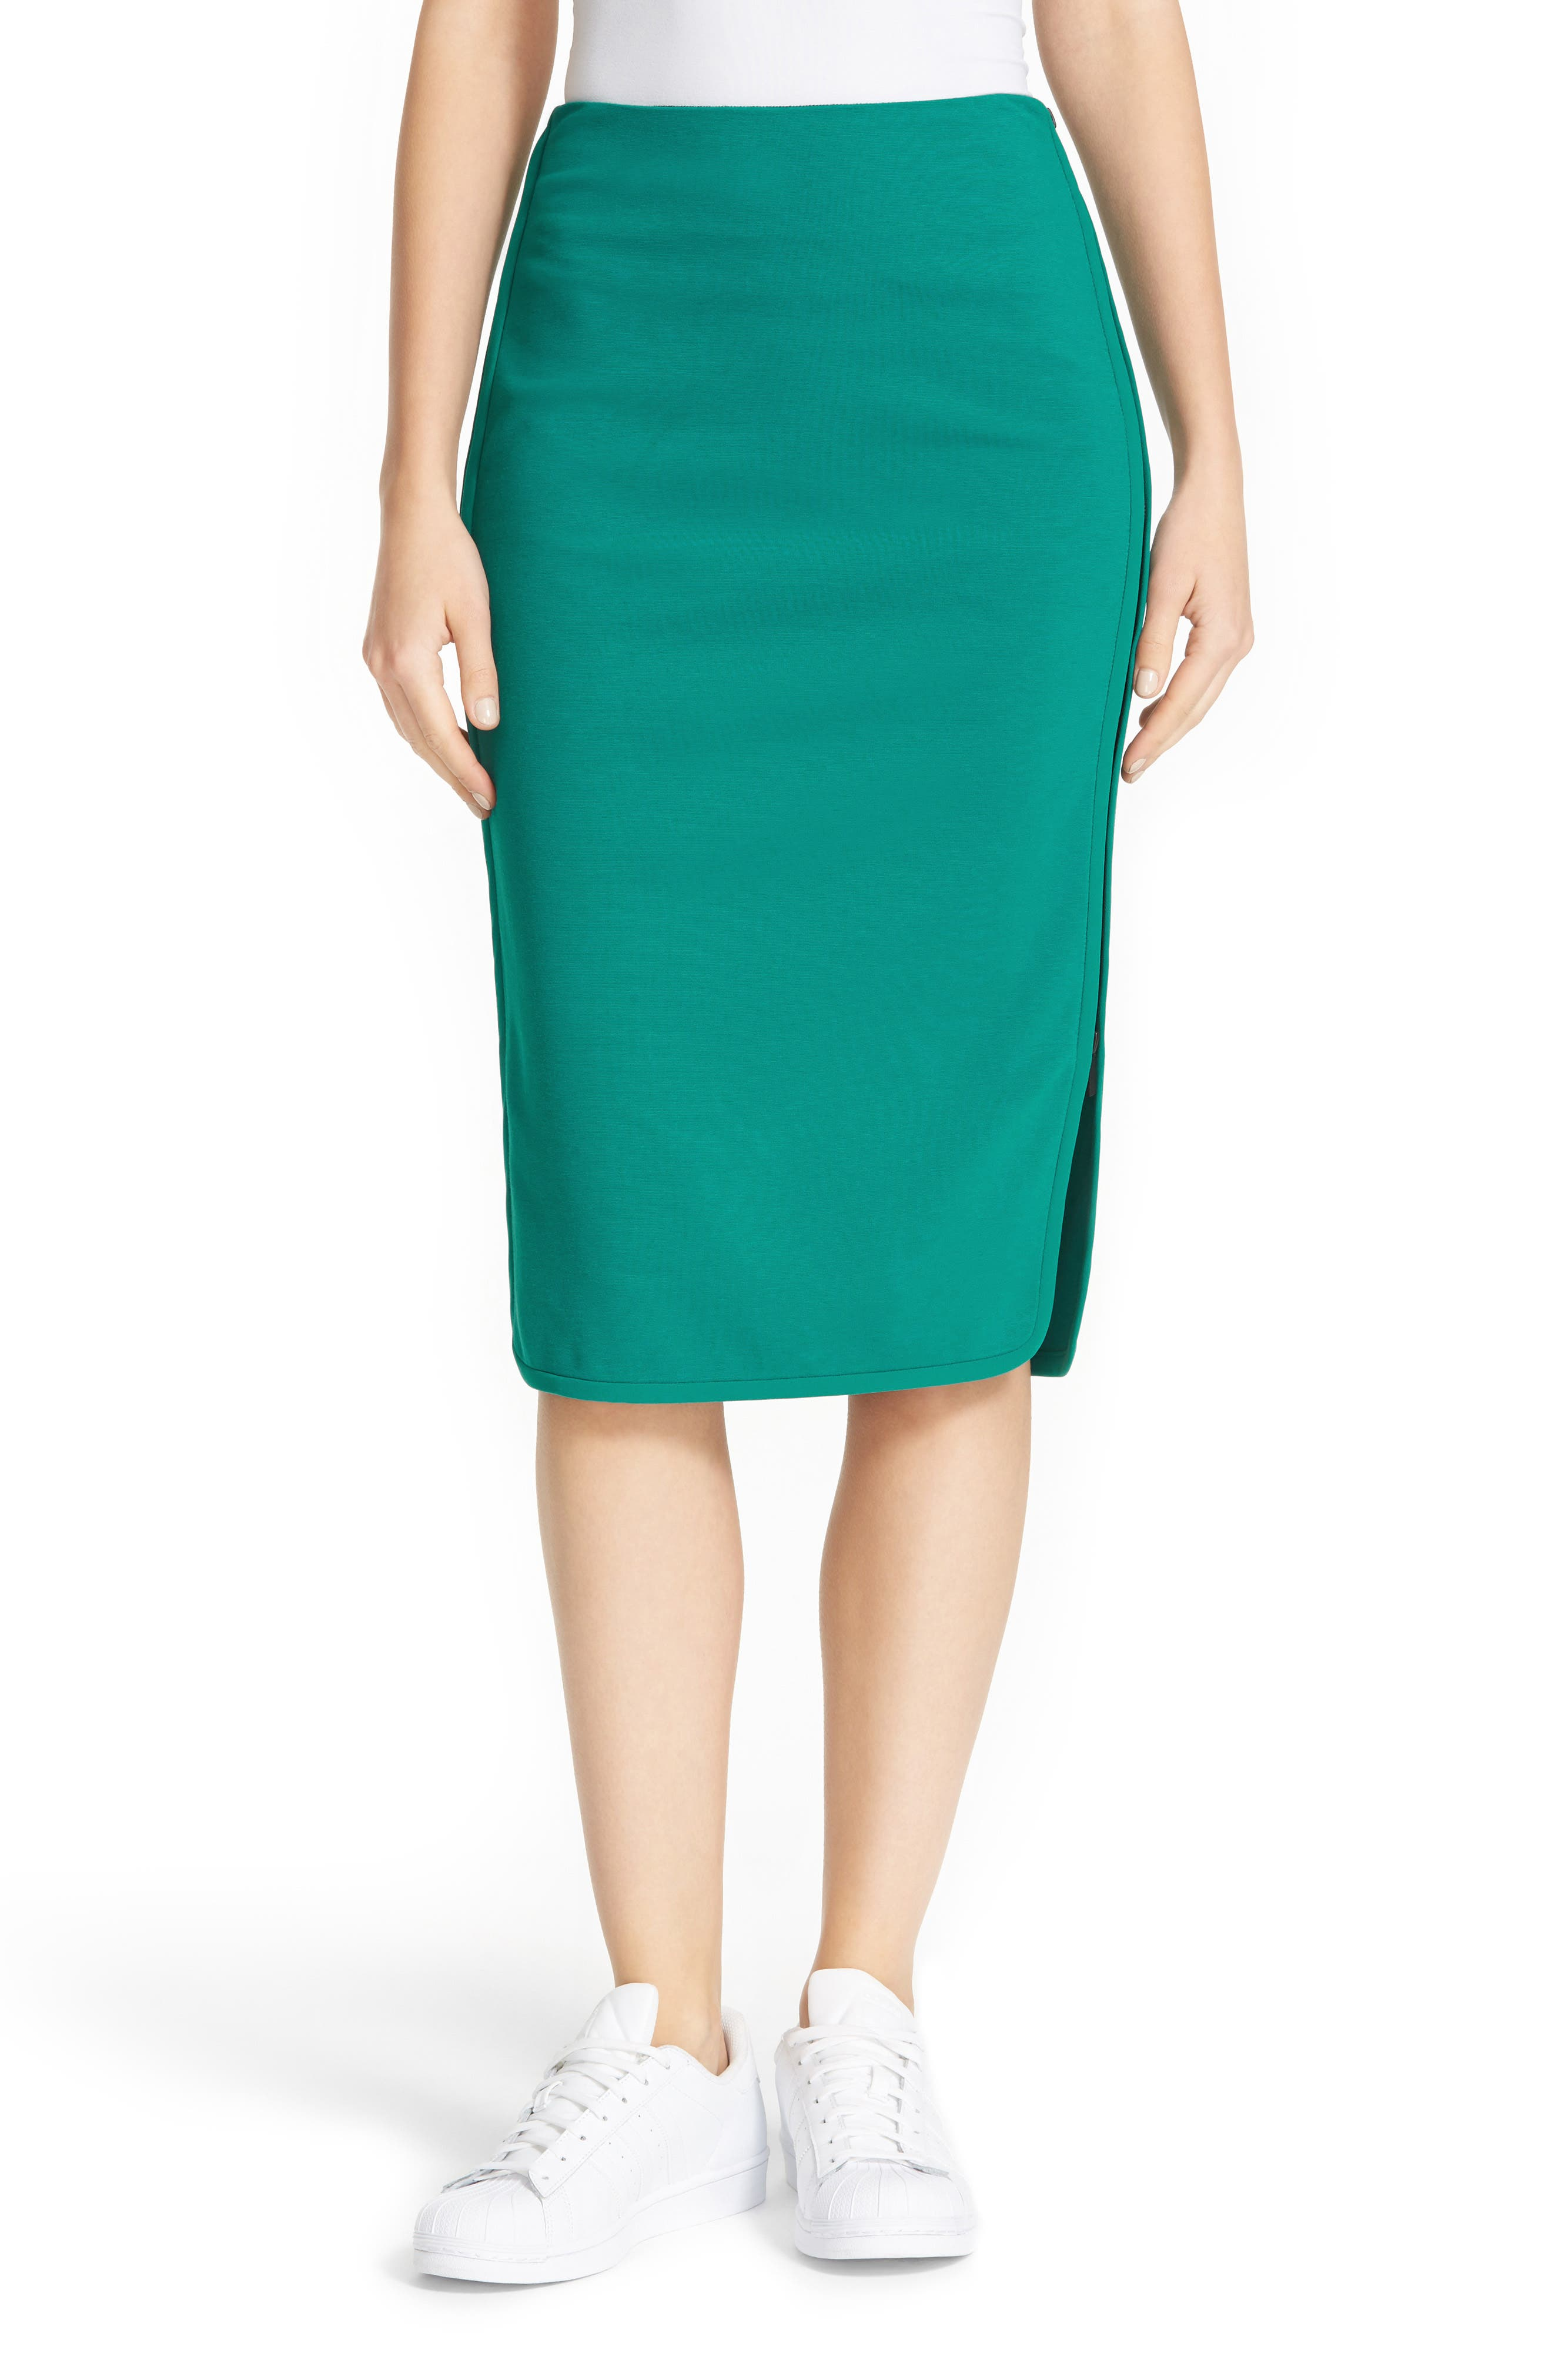 Alternate Image 1 Selected - Diane von Furstenberg Noemi Side Zip Pencil Skirt